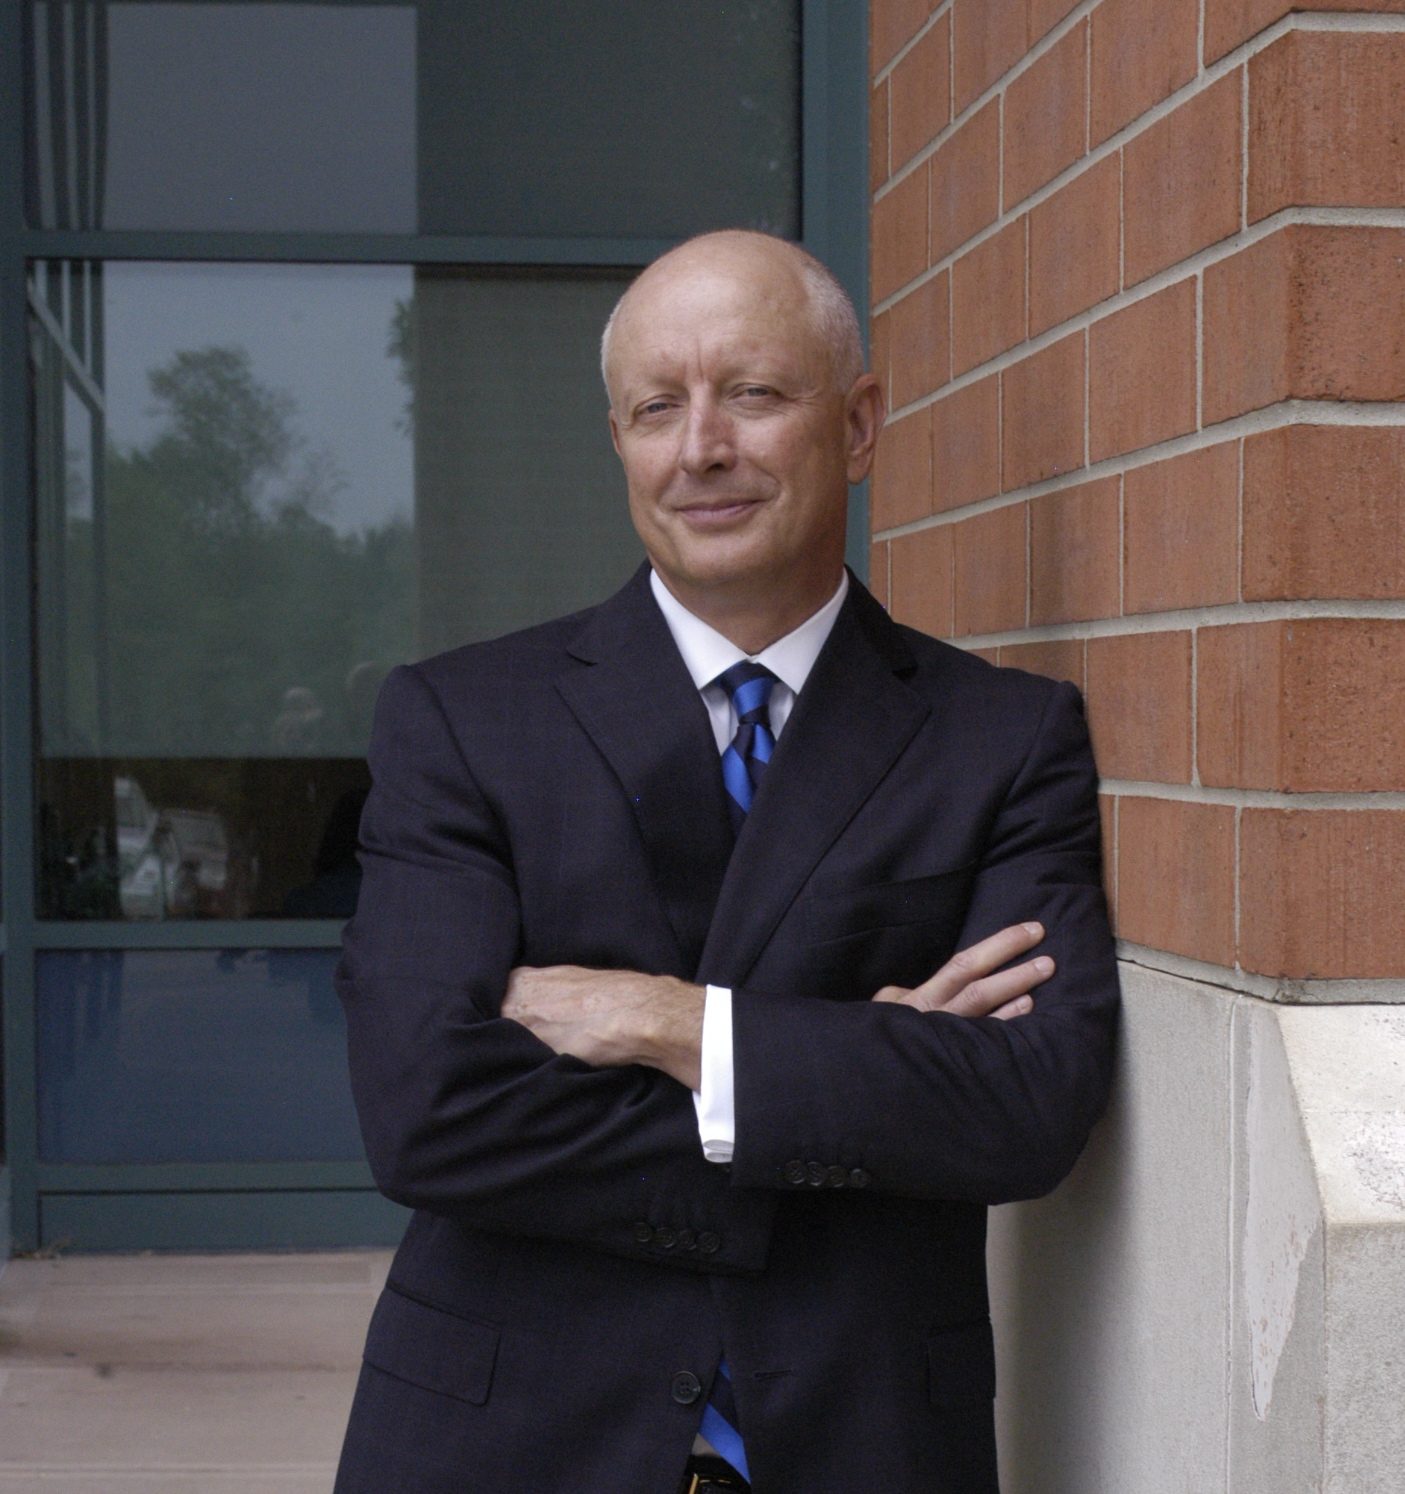 Garrett S. Hoge, RFC, CFP, MS